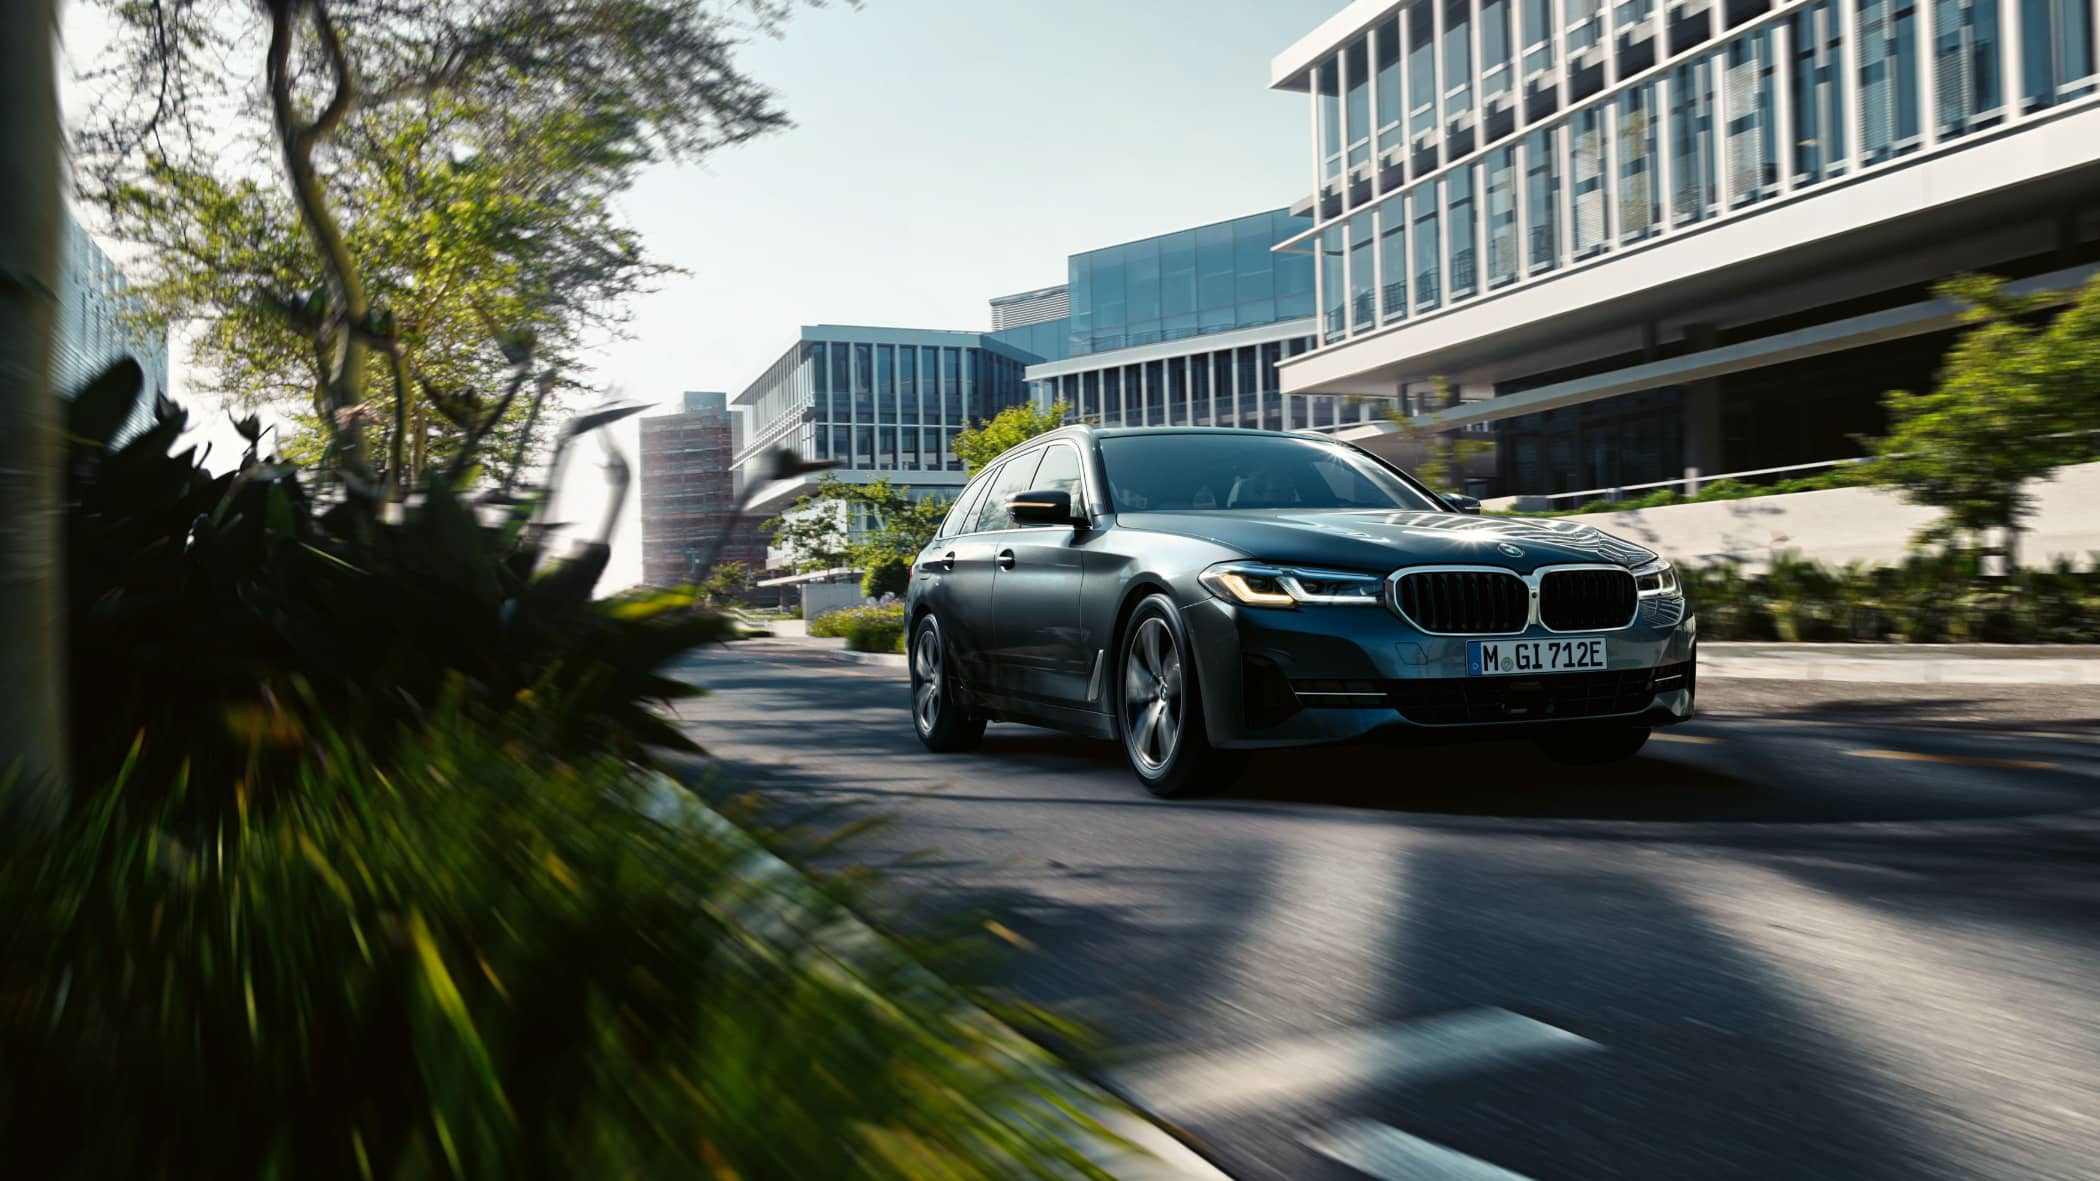 Bmw 3 series f30, Personal luxury car, Automotive design, Land vehicle